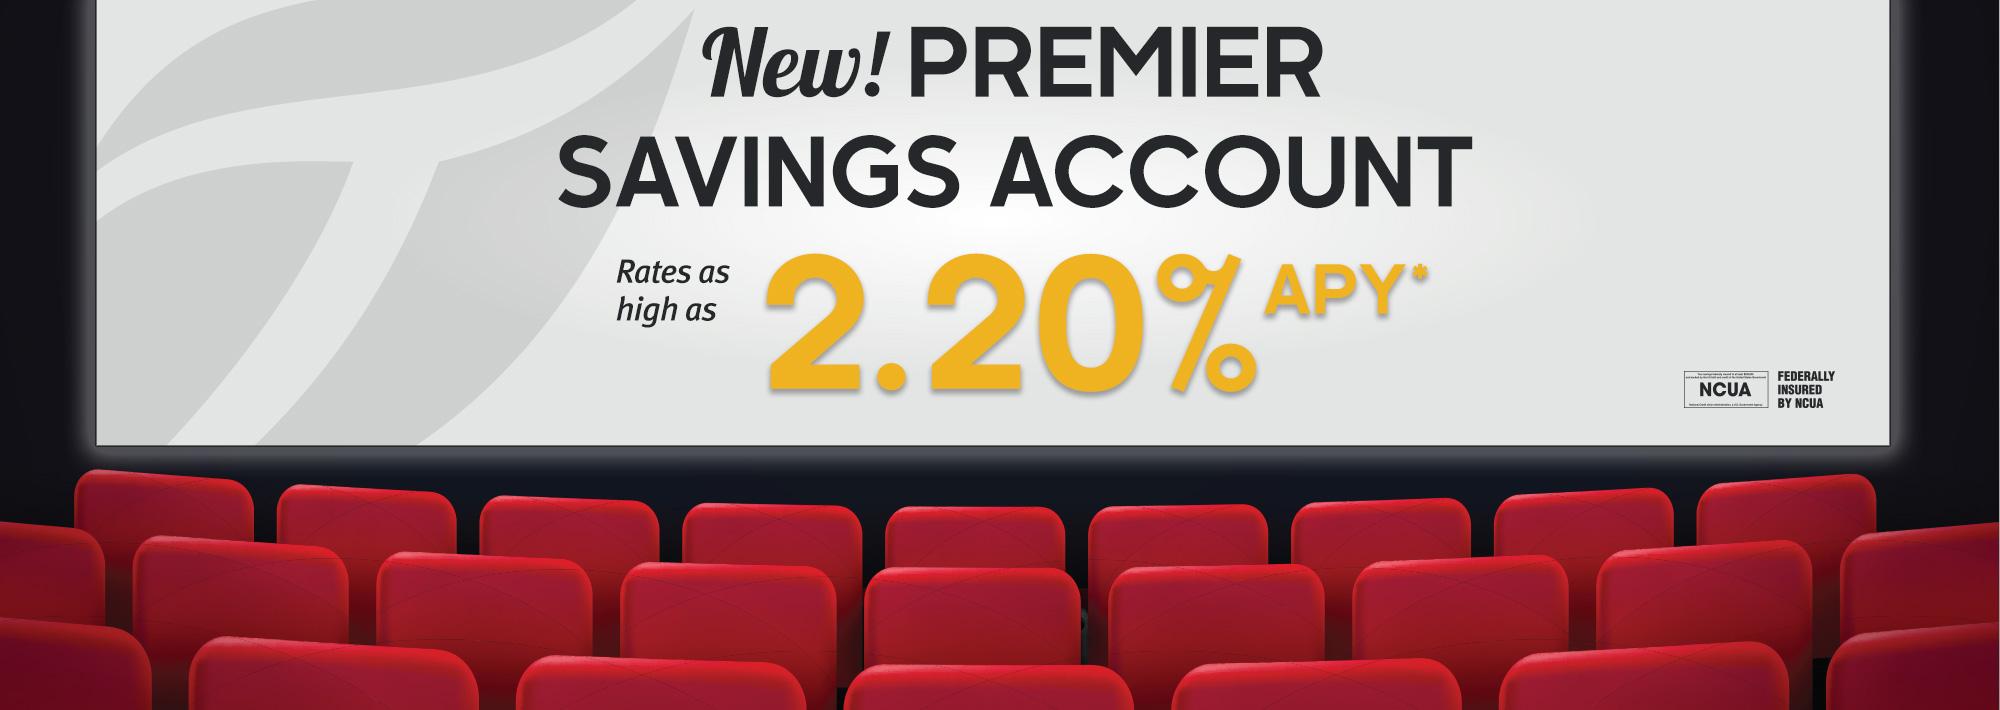 Premier Savings